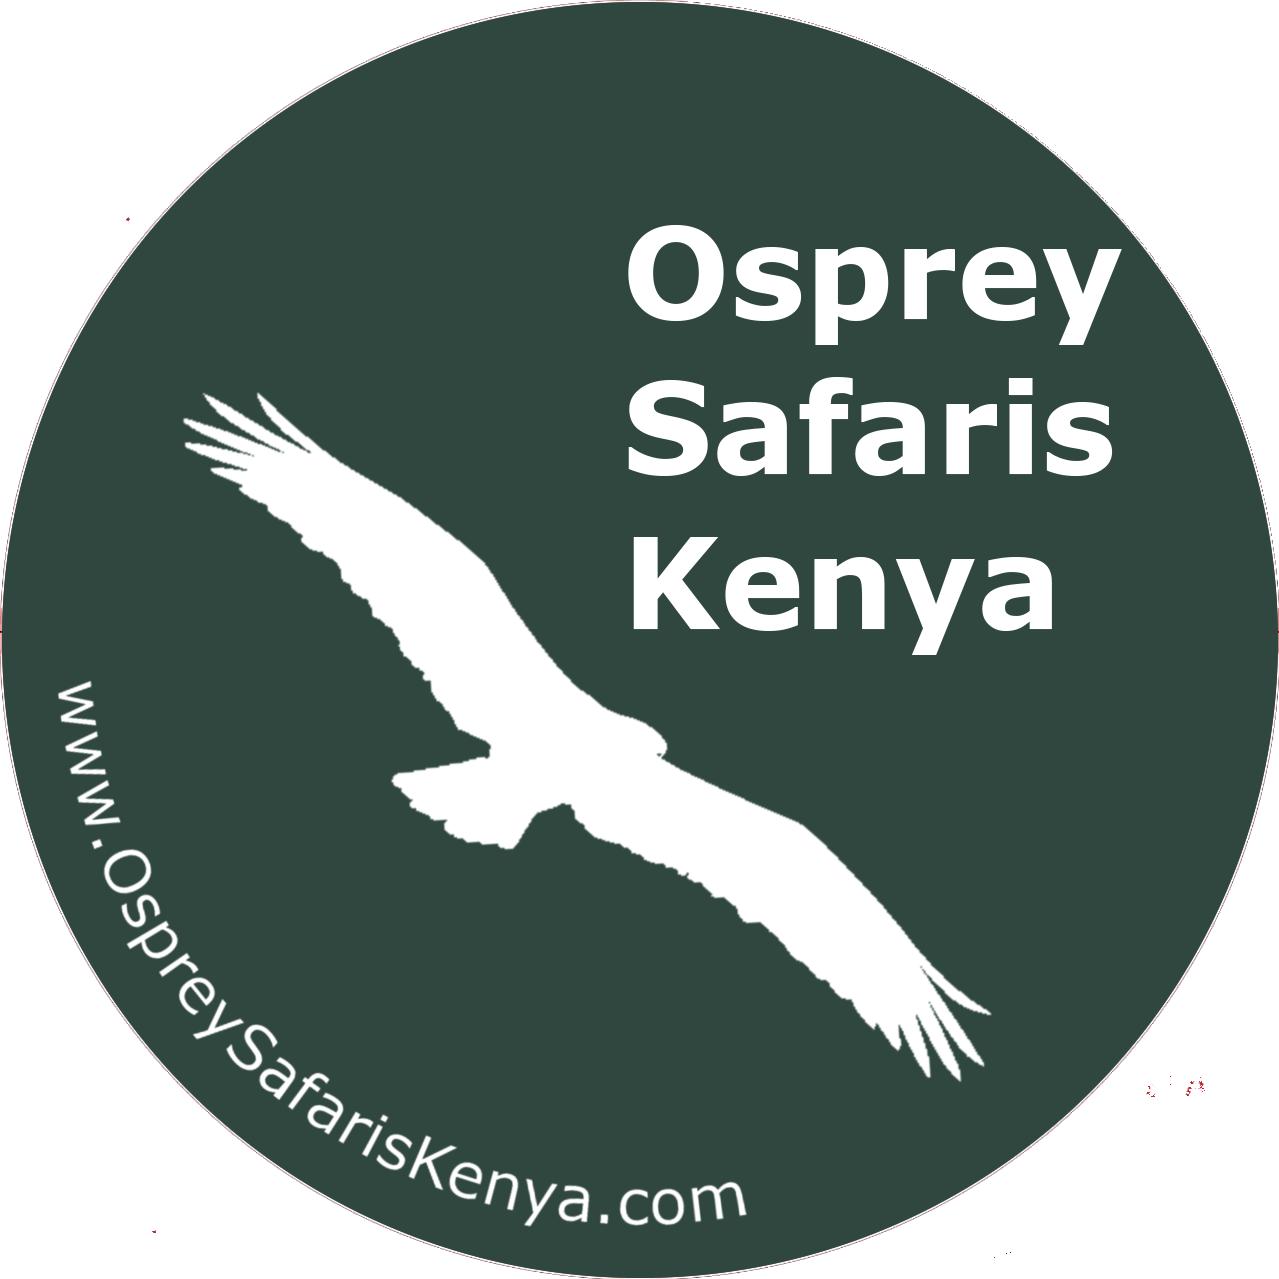 Logo-Osprey-Safari-bosscustomz.co.ke